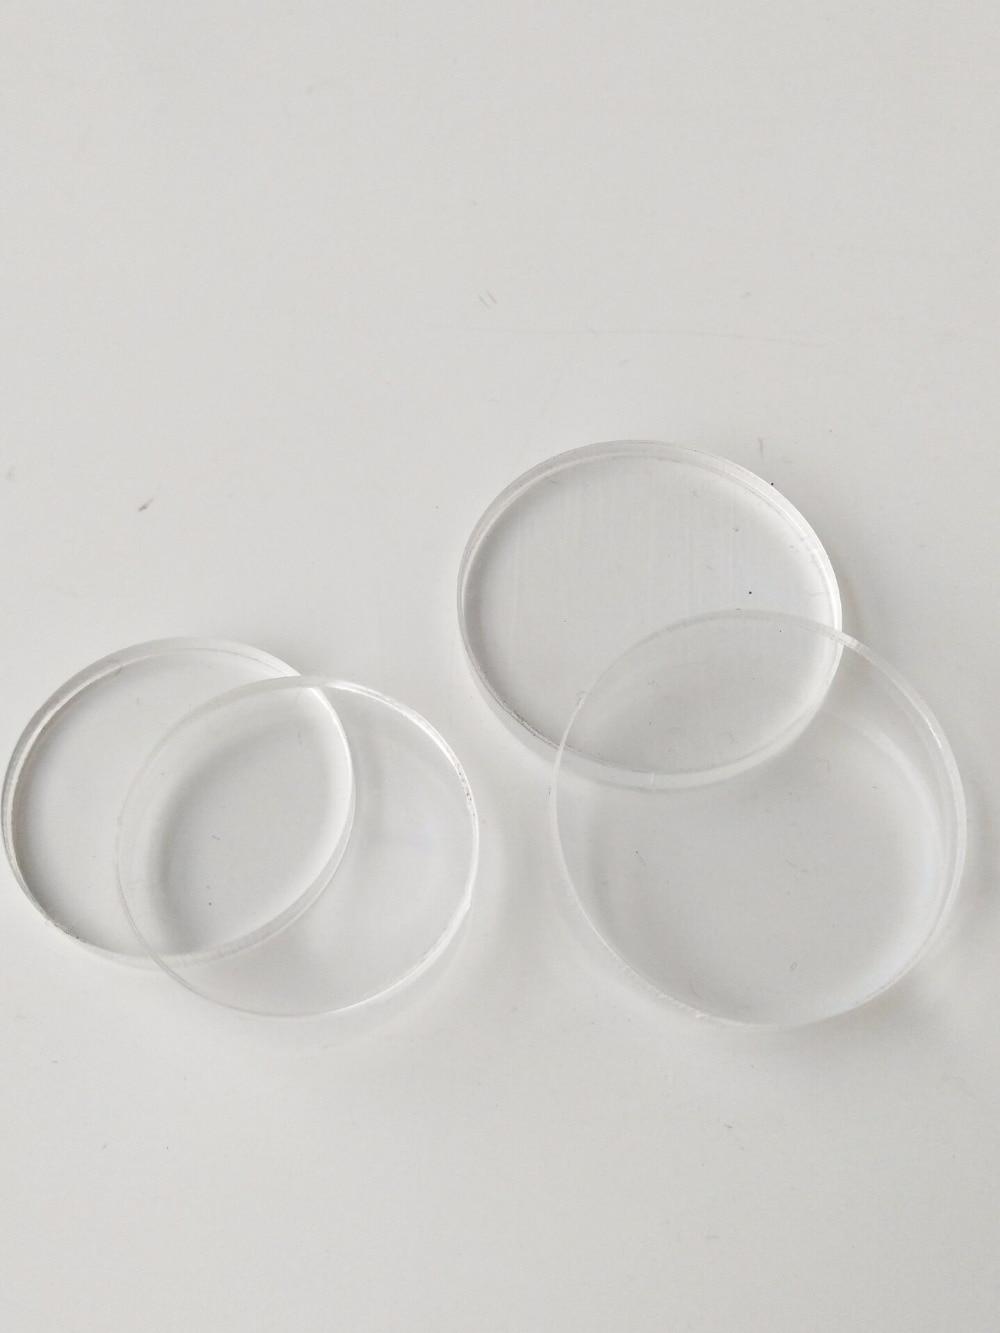 "Clear Round  Sheet plexiglass 1pc Acrylic Plastic 3//16/"" x 7/""  Circle"